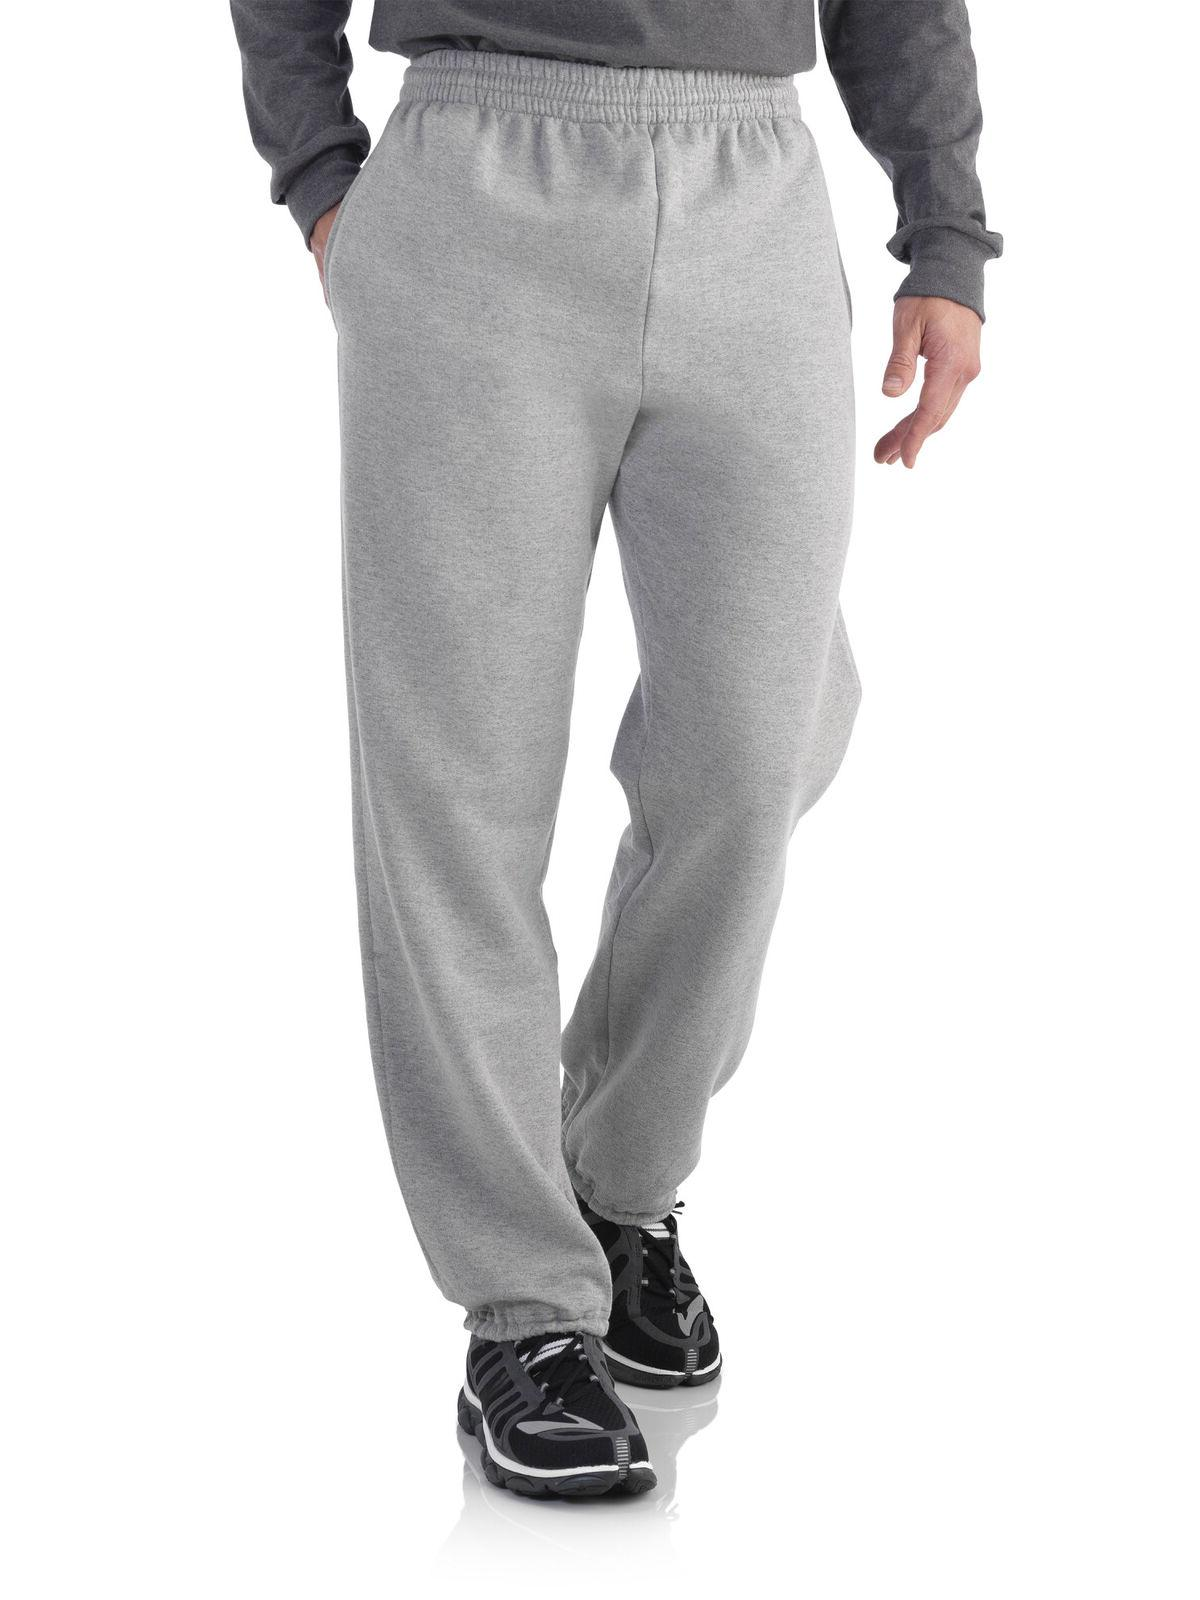 men s elastic bottom sweatpants size large